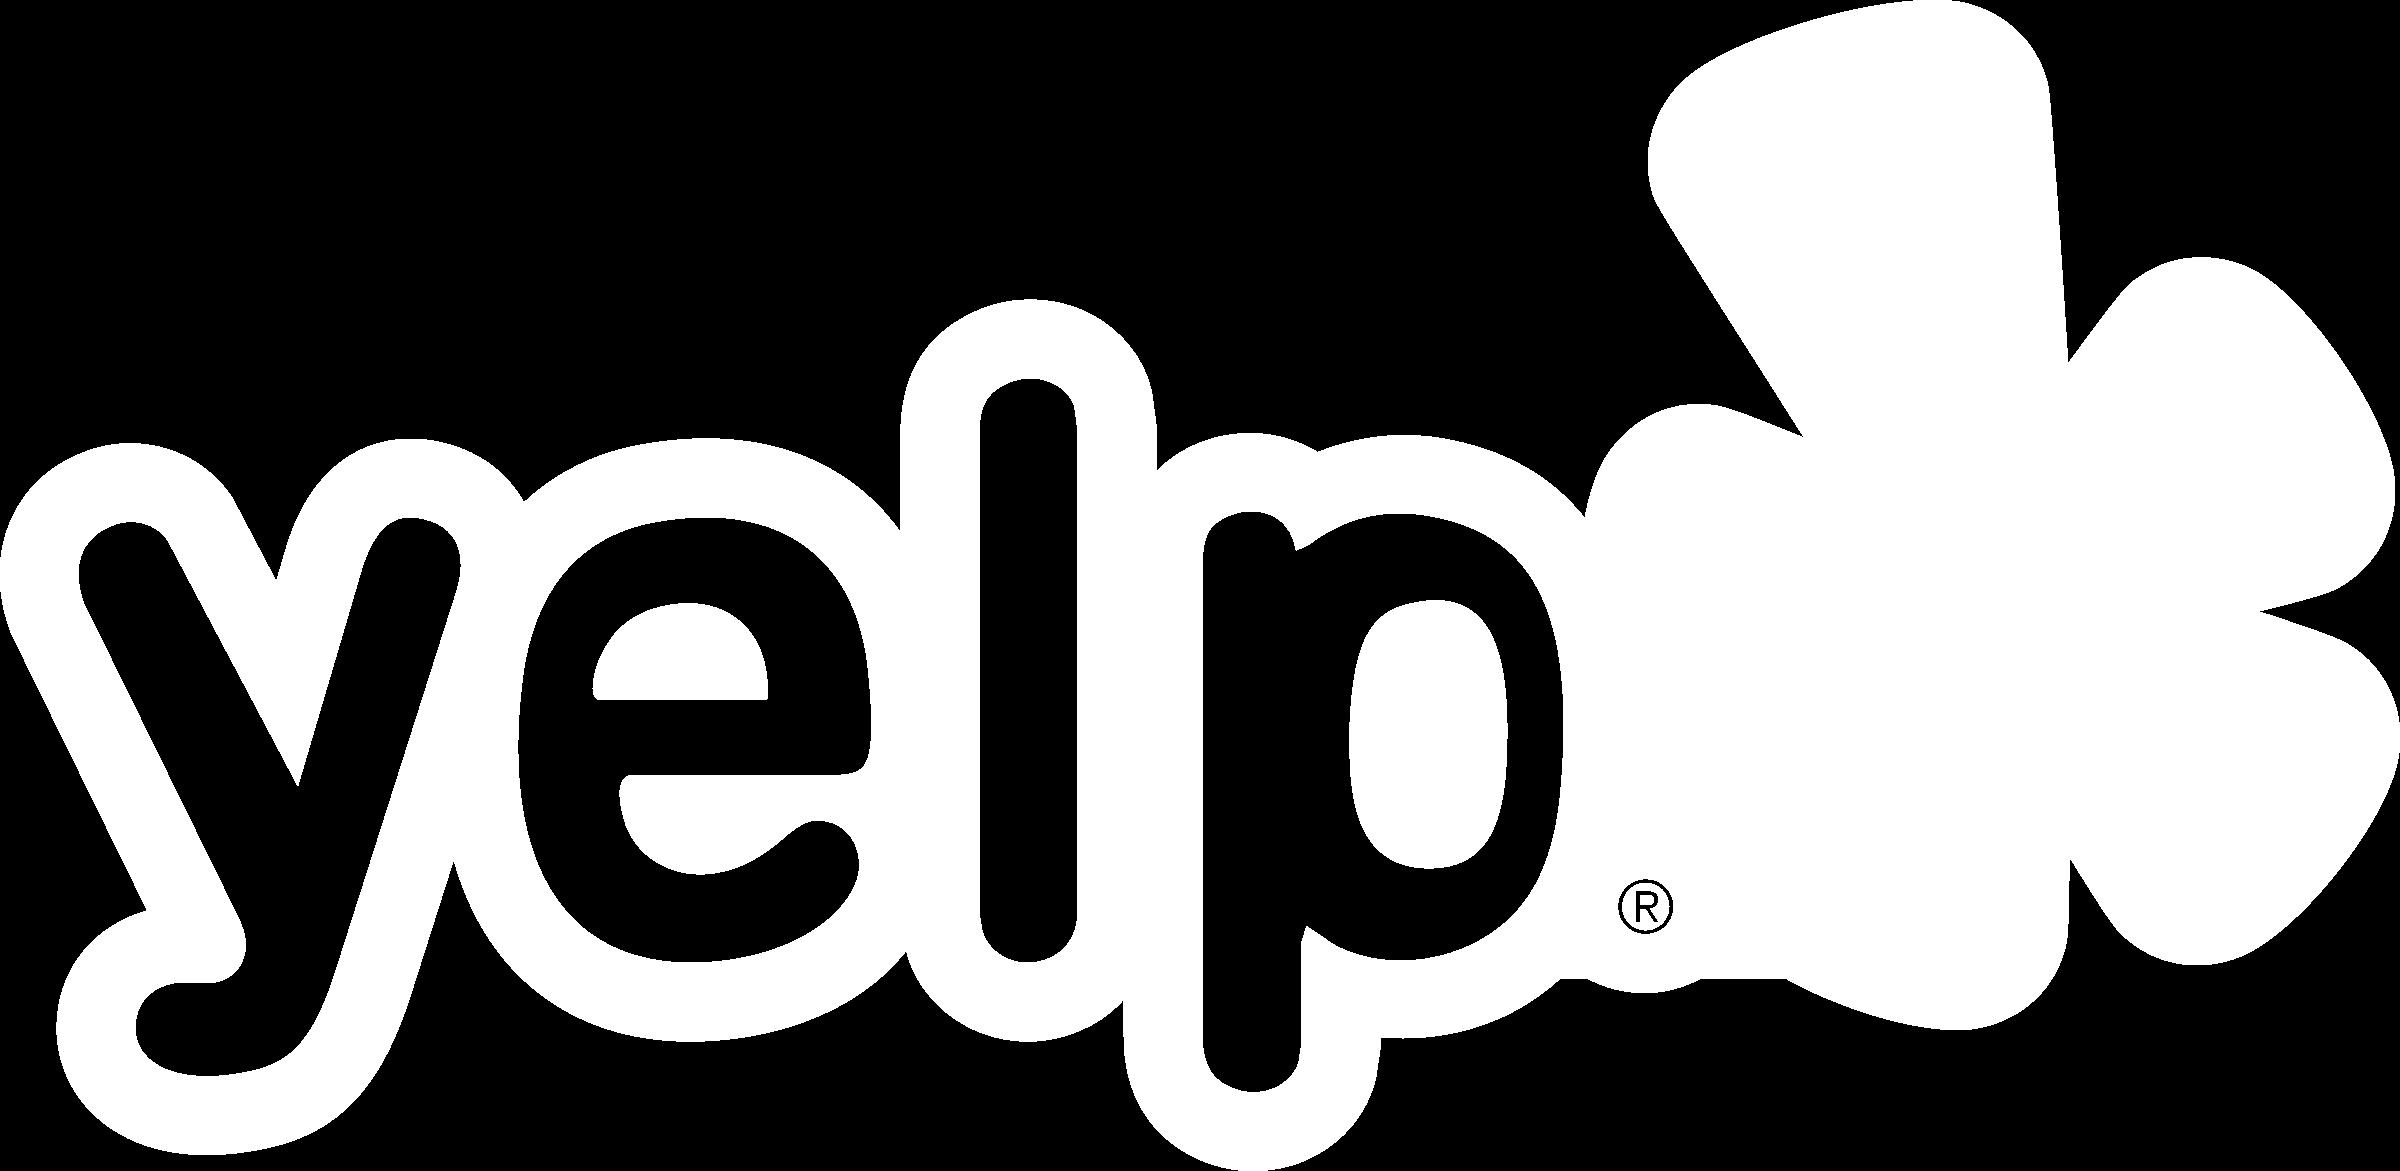 yelp logo png transparent svg vector freebie supply rh freebiesupply com yelp logo images yelp logon